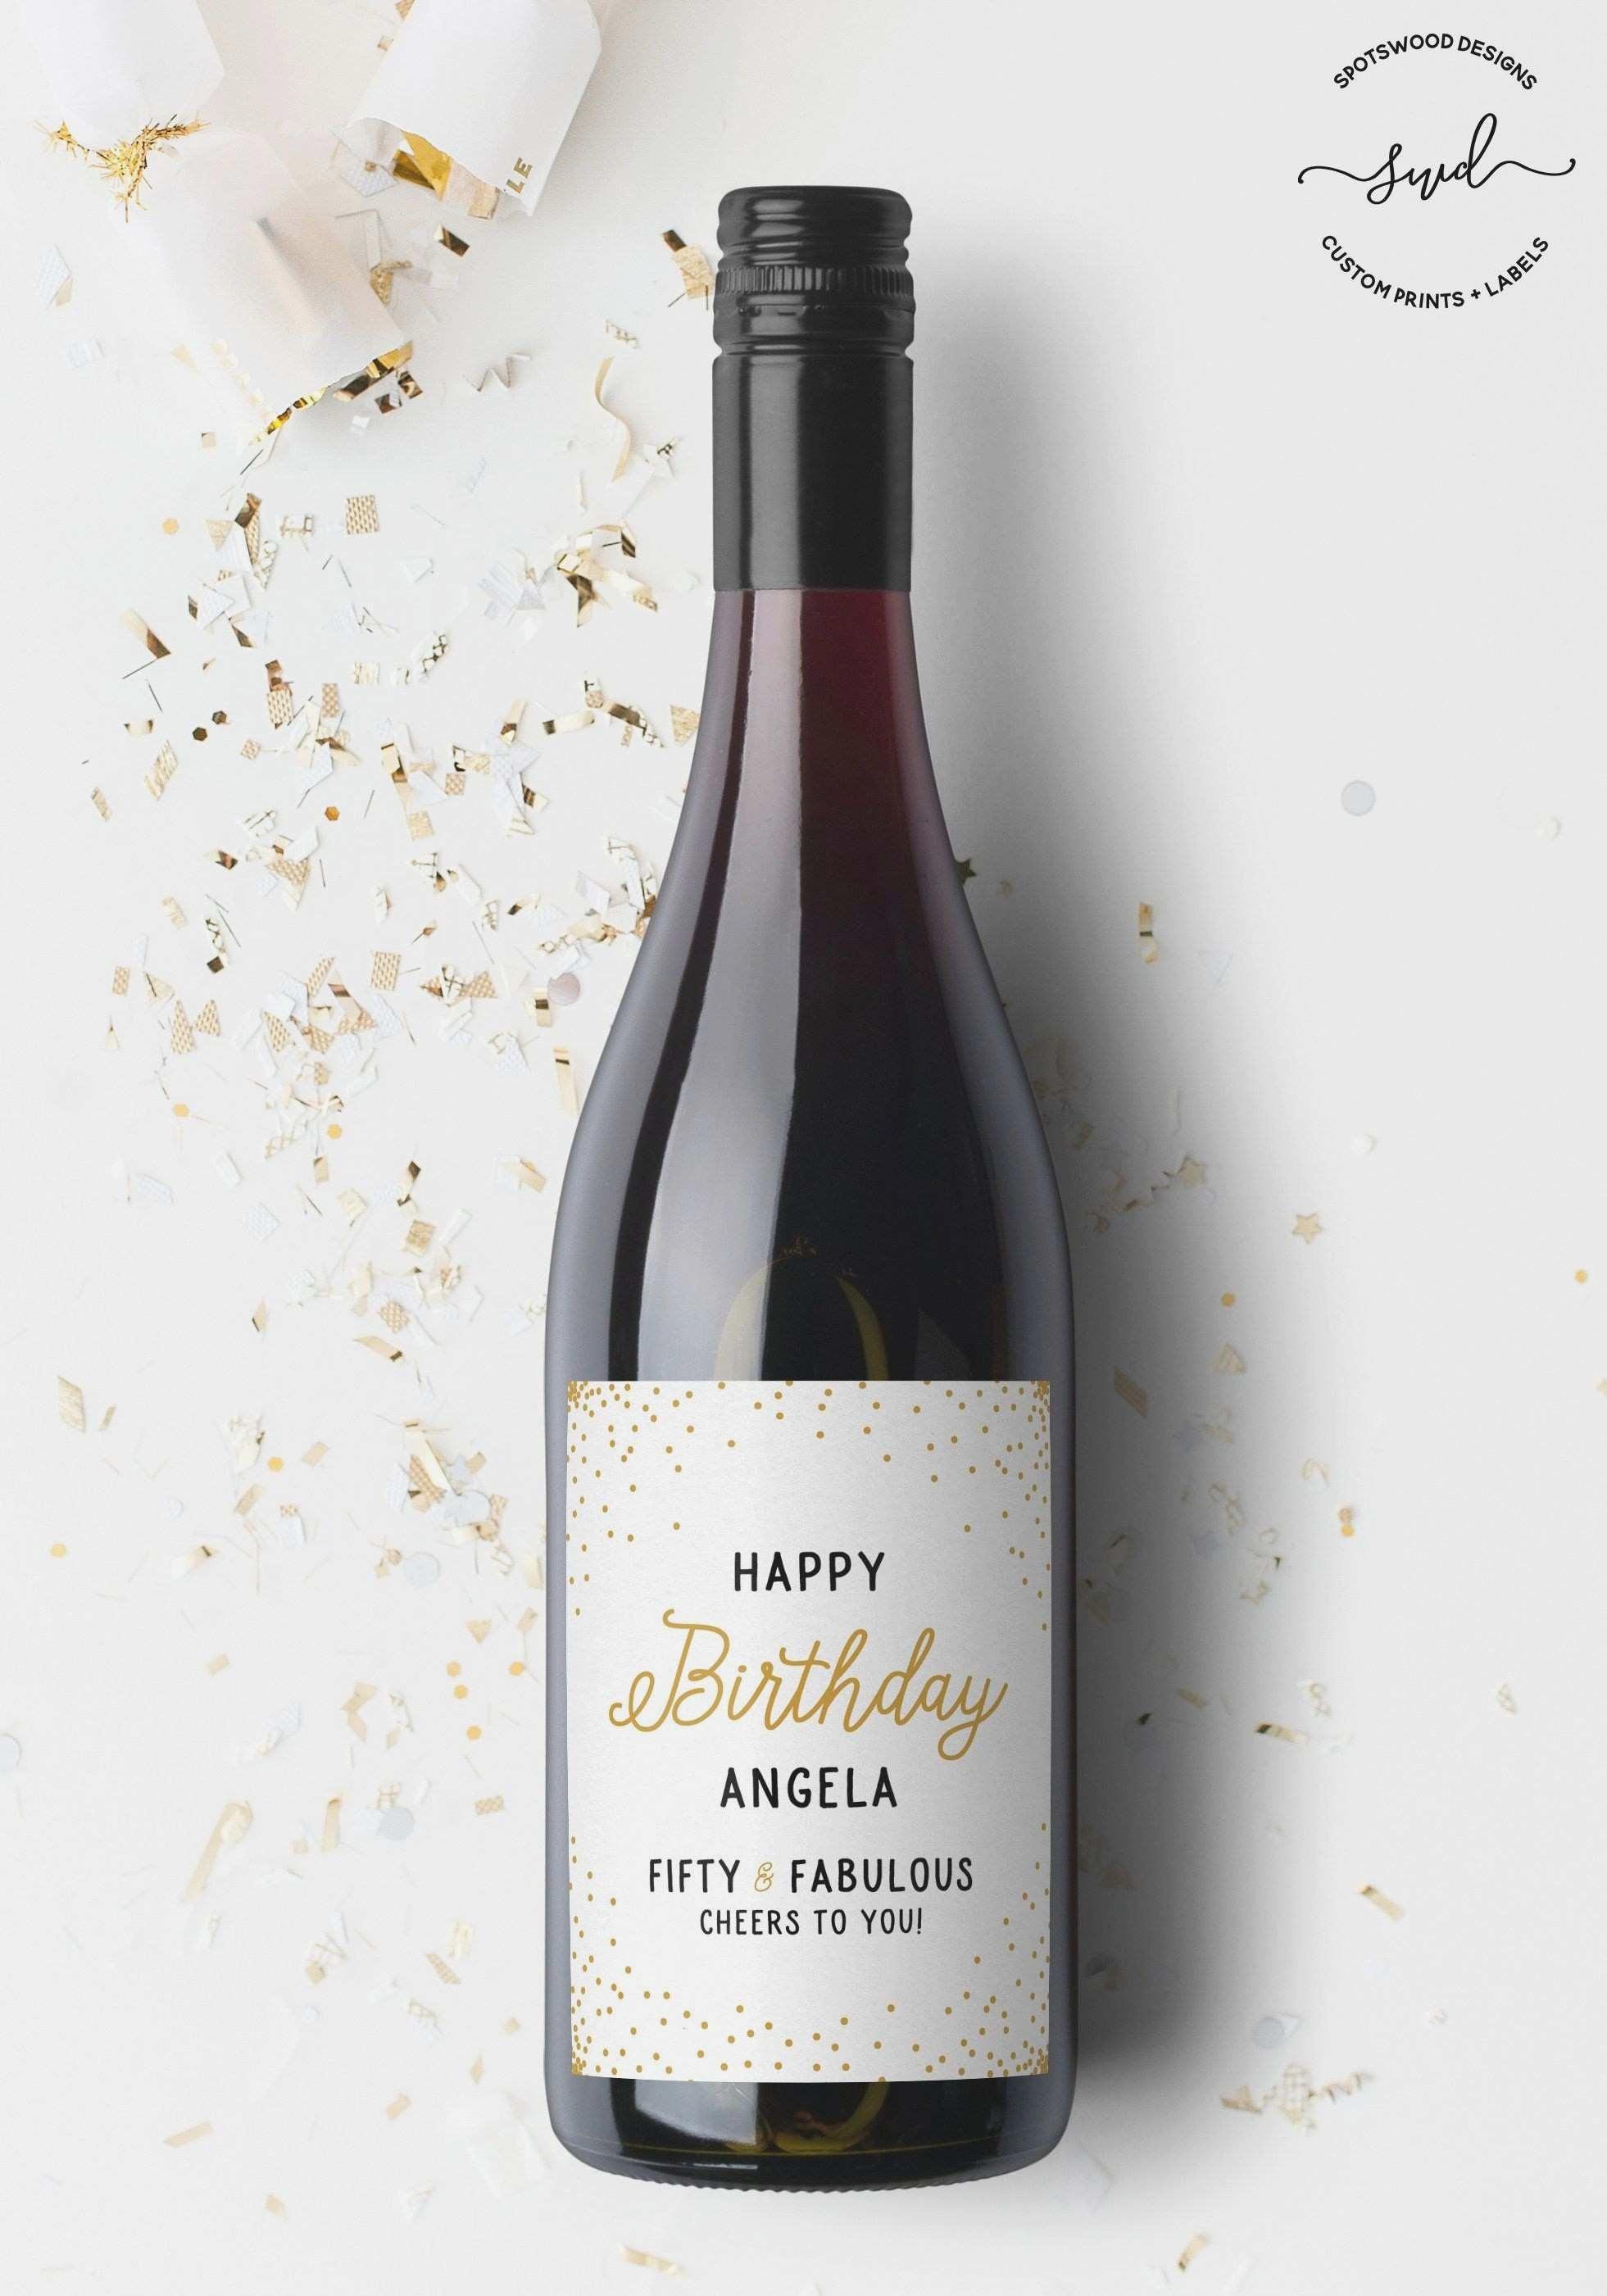 Simple Wine Label Design Templates Free - Acilmalumat - Free Printable Wine Labels